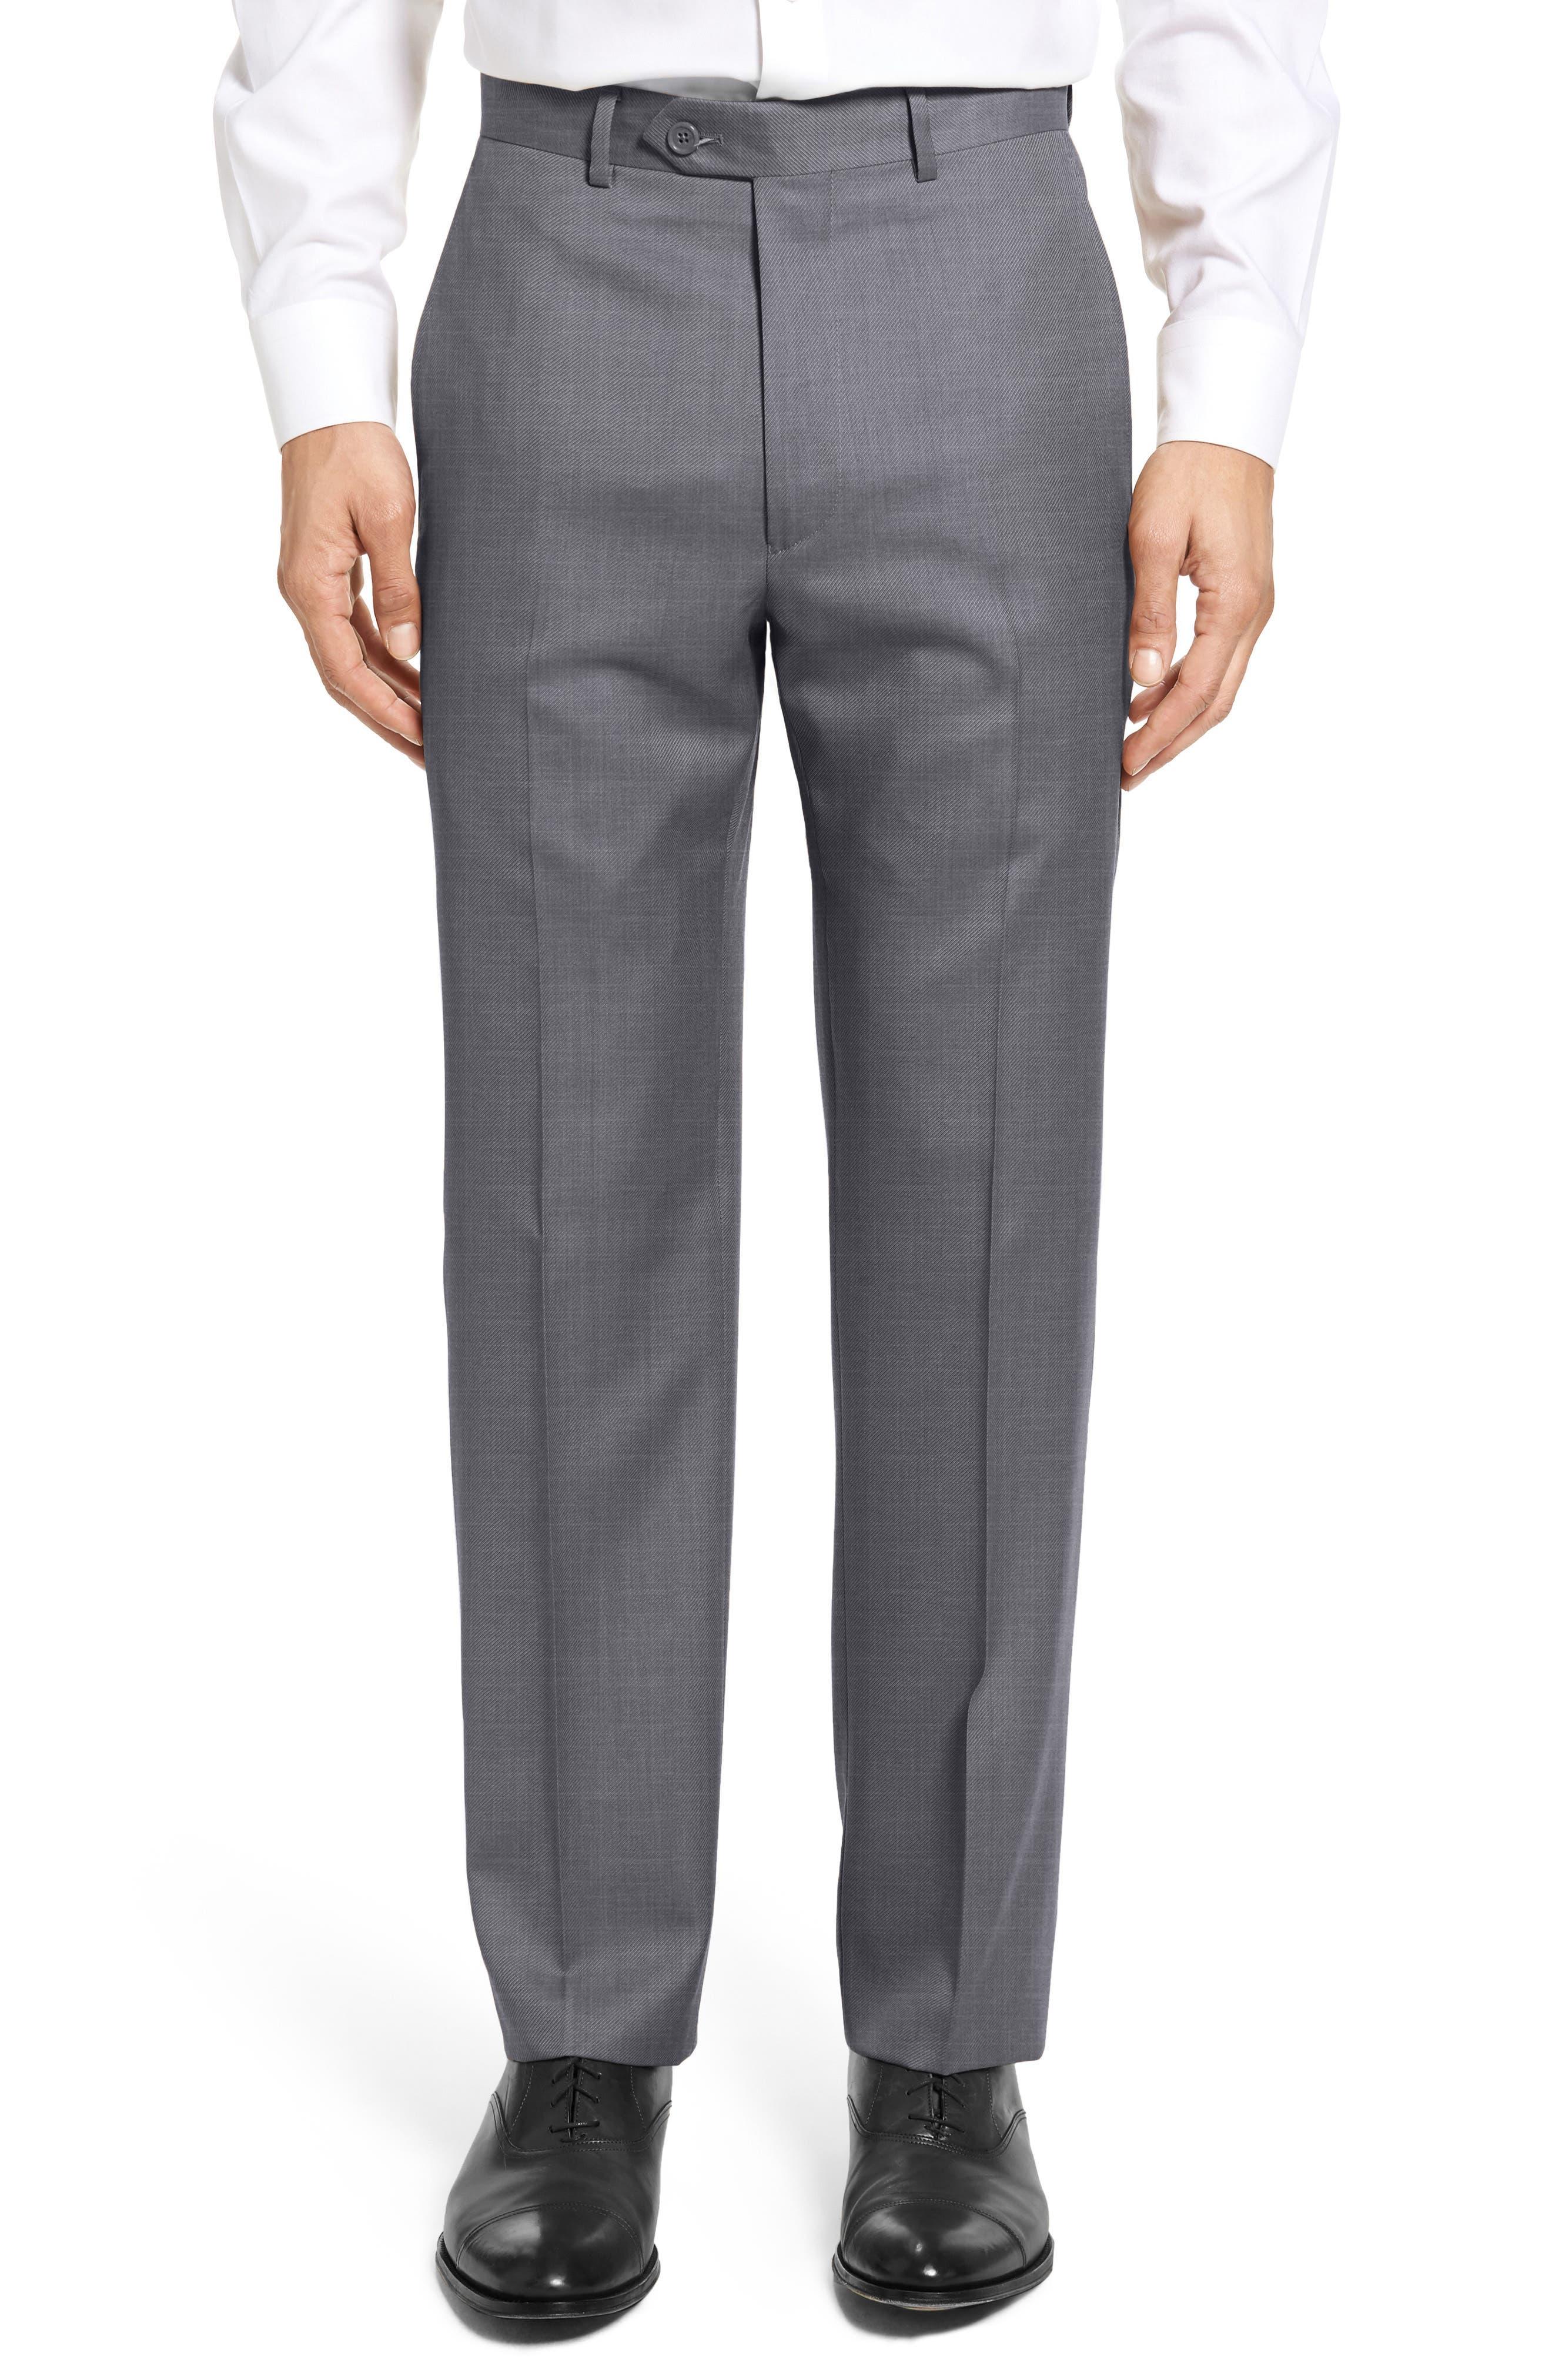 SANTORELLI Flat Front Twill Wool Trousers in Medium Grey